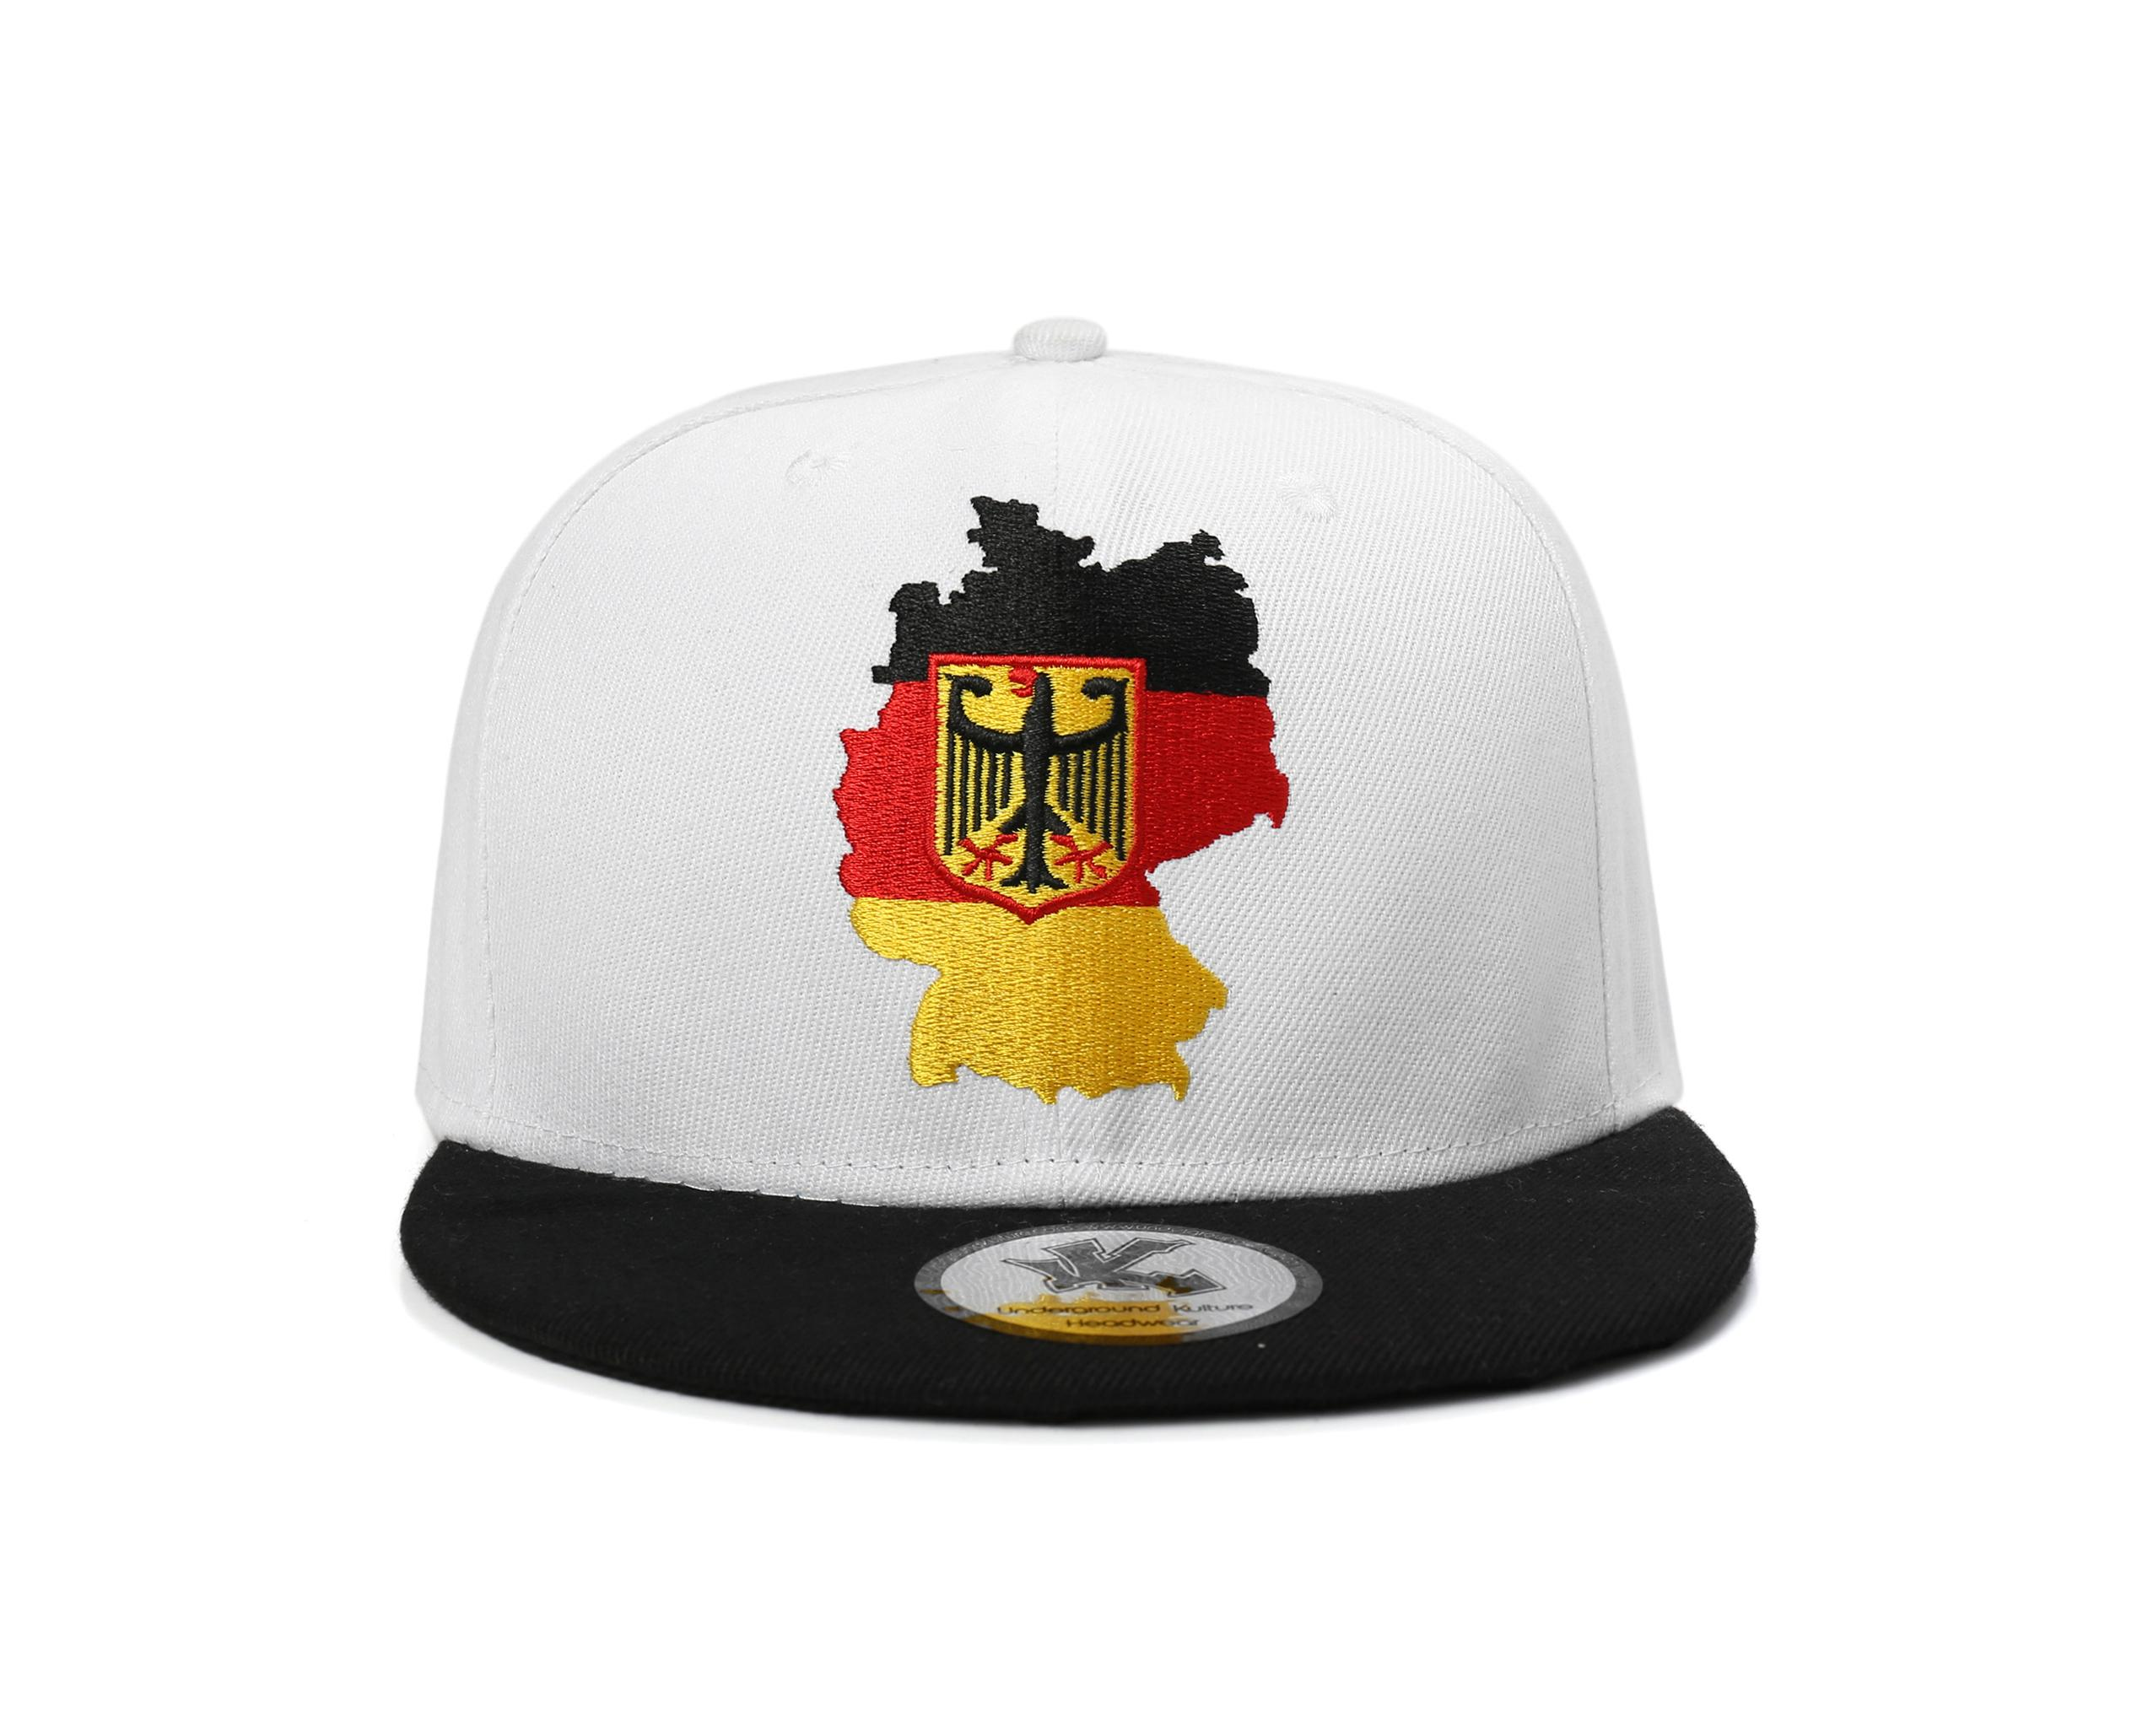 Compre 2016 Underground Kulture Alemania Snapback Gorra De Béisbol HipHop  Flat Peak Fresco Sombrero Moda Popular Producto Caliente A  6.83 Del  Happy erica ... 8a67fff54f5